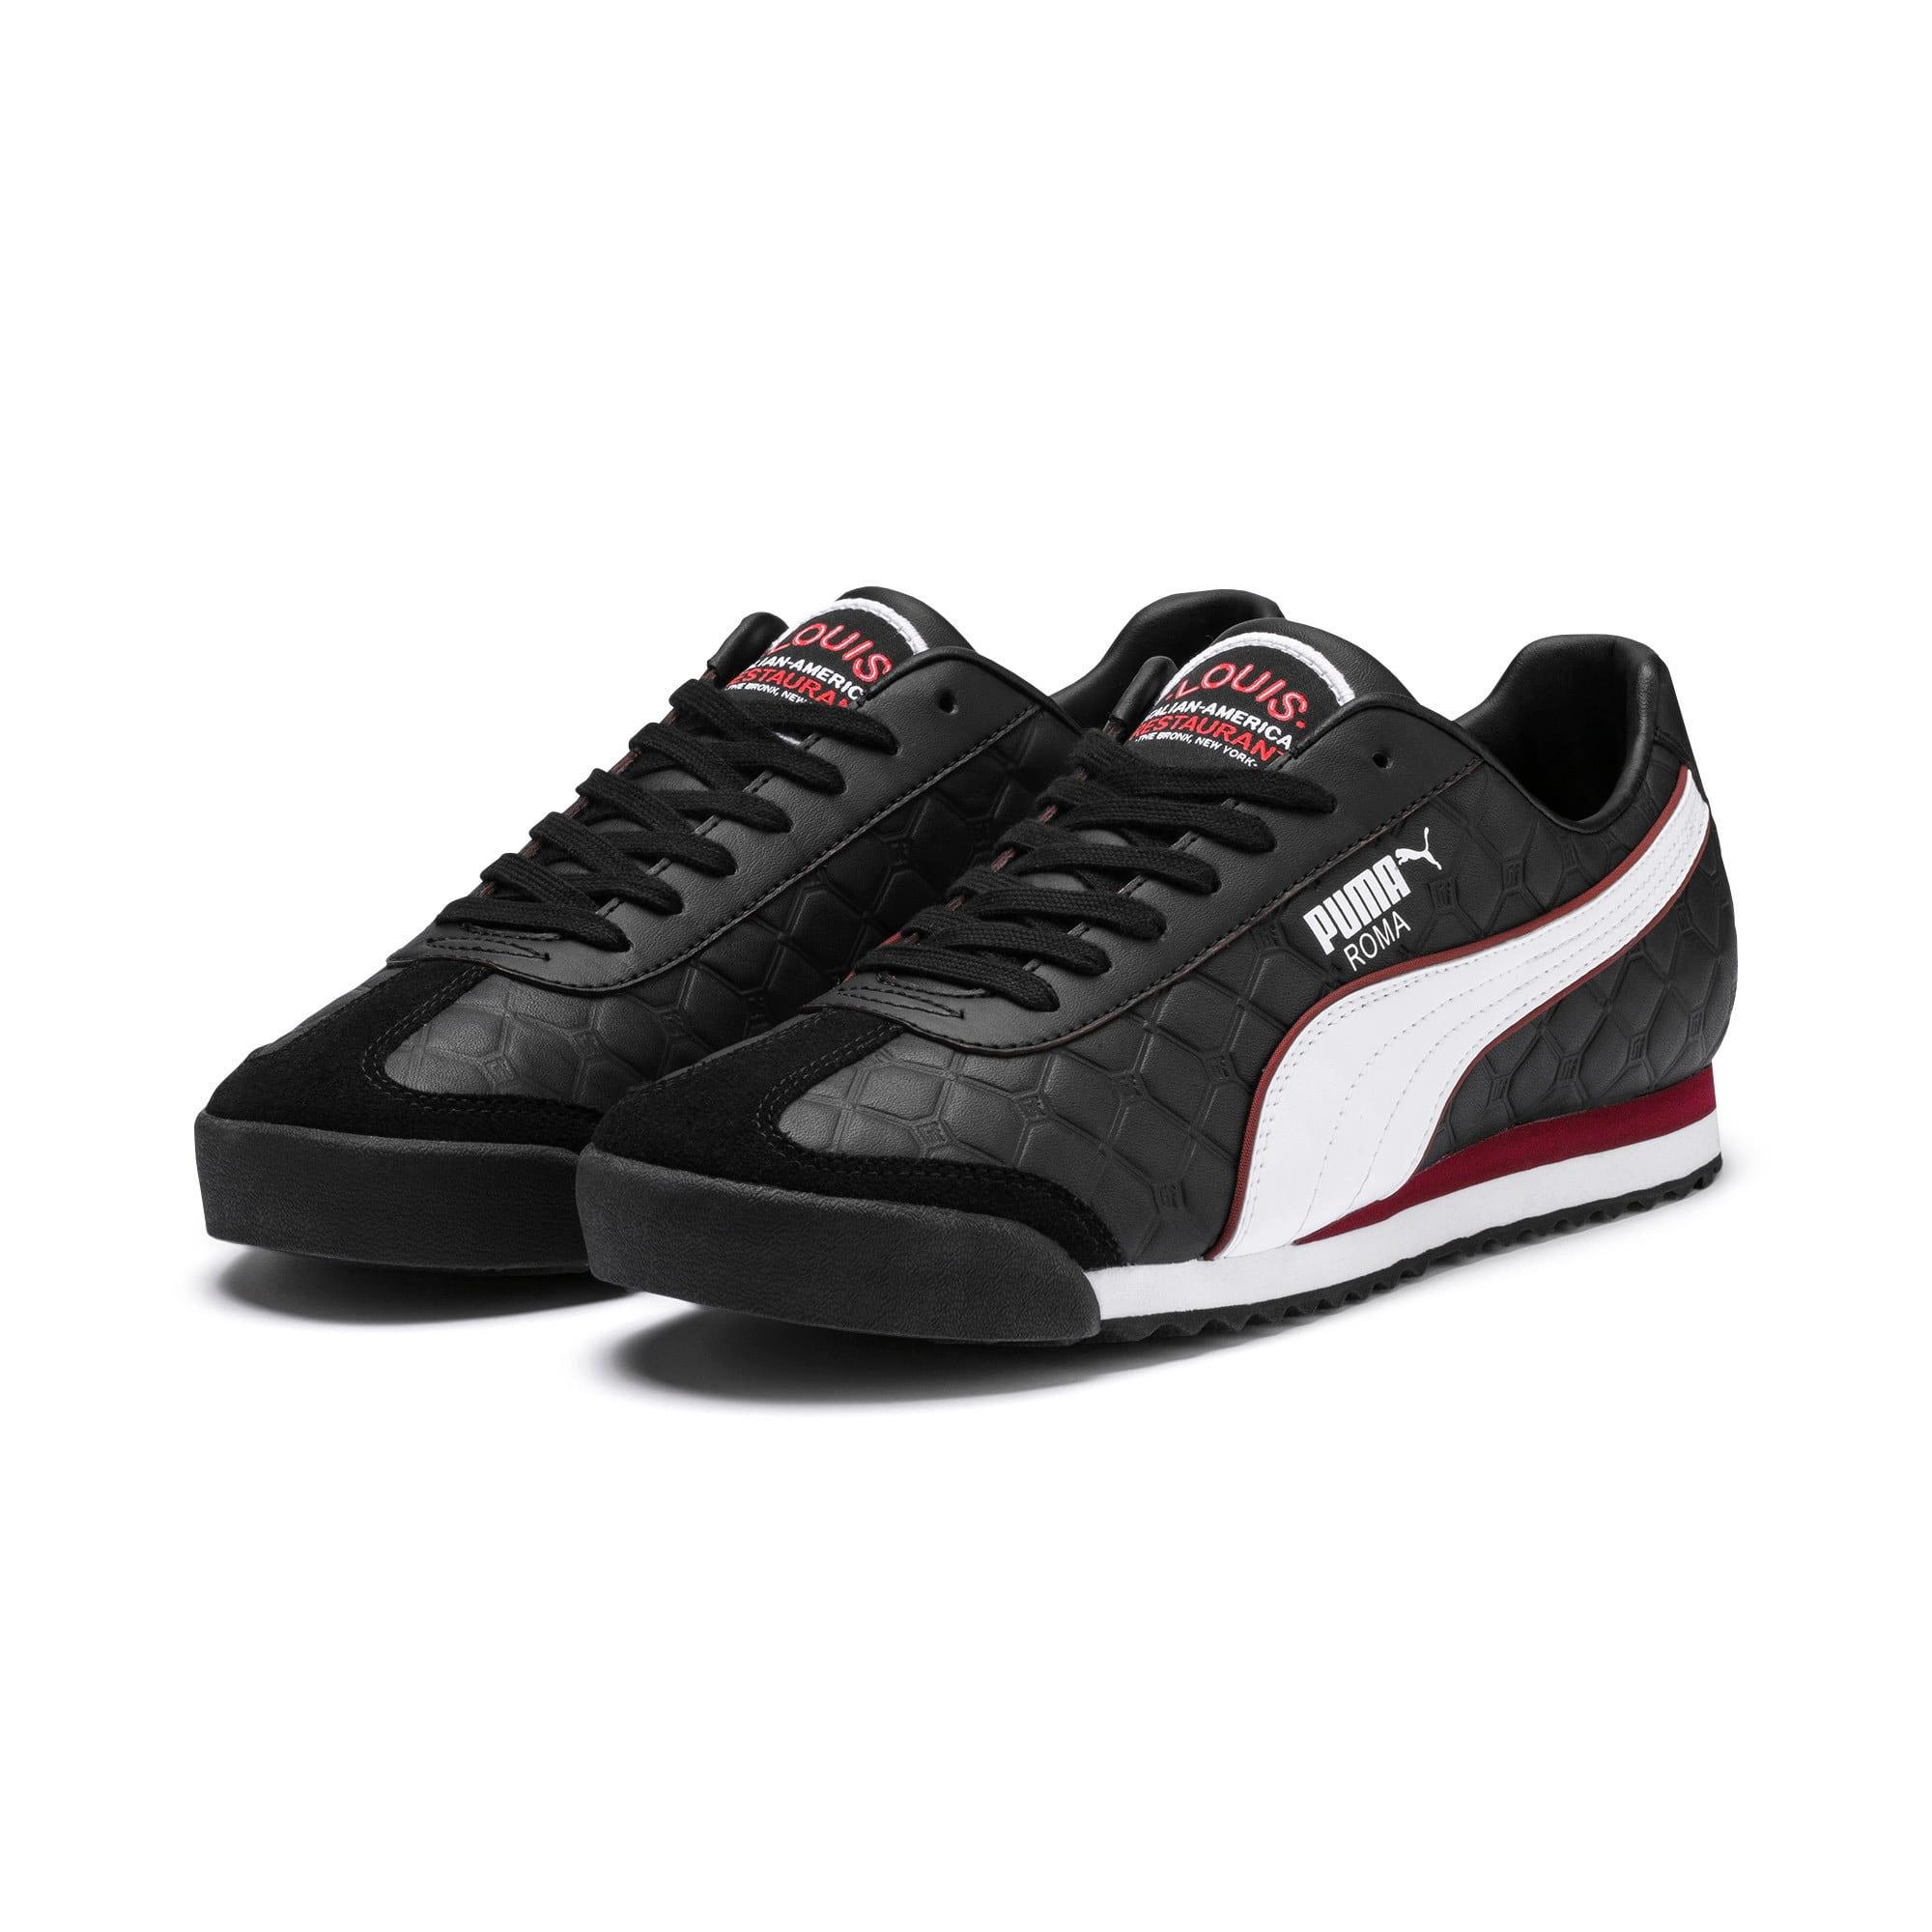 Miniatura 2 de Zapatos deportivos PUMA x THE GODFATHER Roma Louis, Puma Black-Fired Brick, mediano